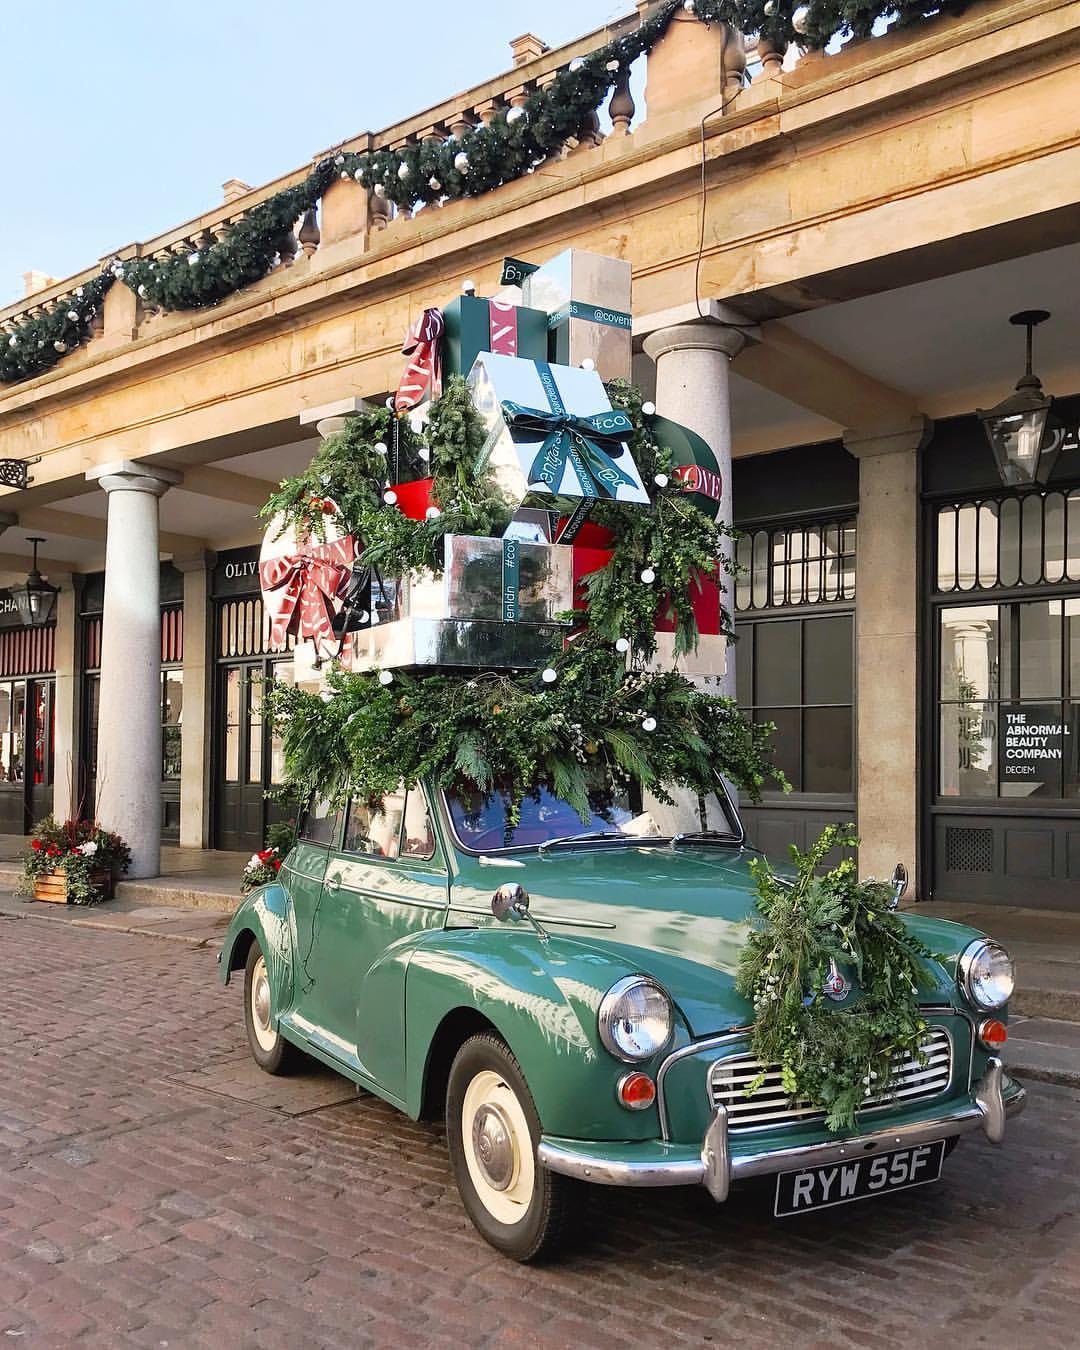 Decorazioni Natalizie Londra 2019.Covent Garden Photo By Shelbybisou On Ig London Calling Nel